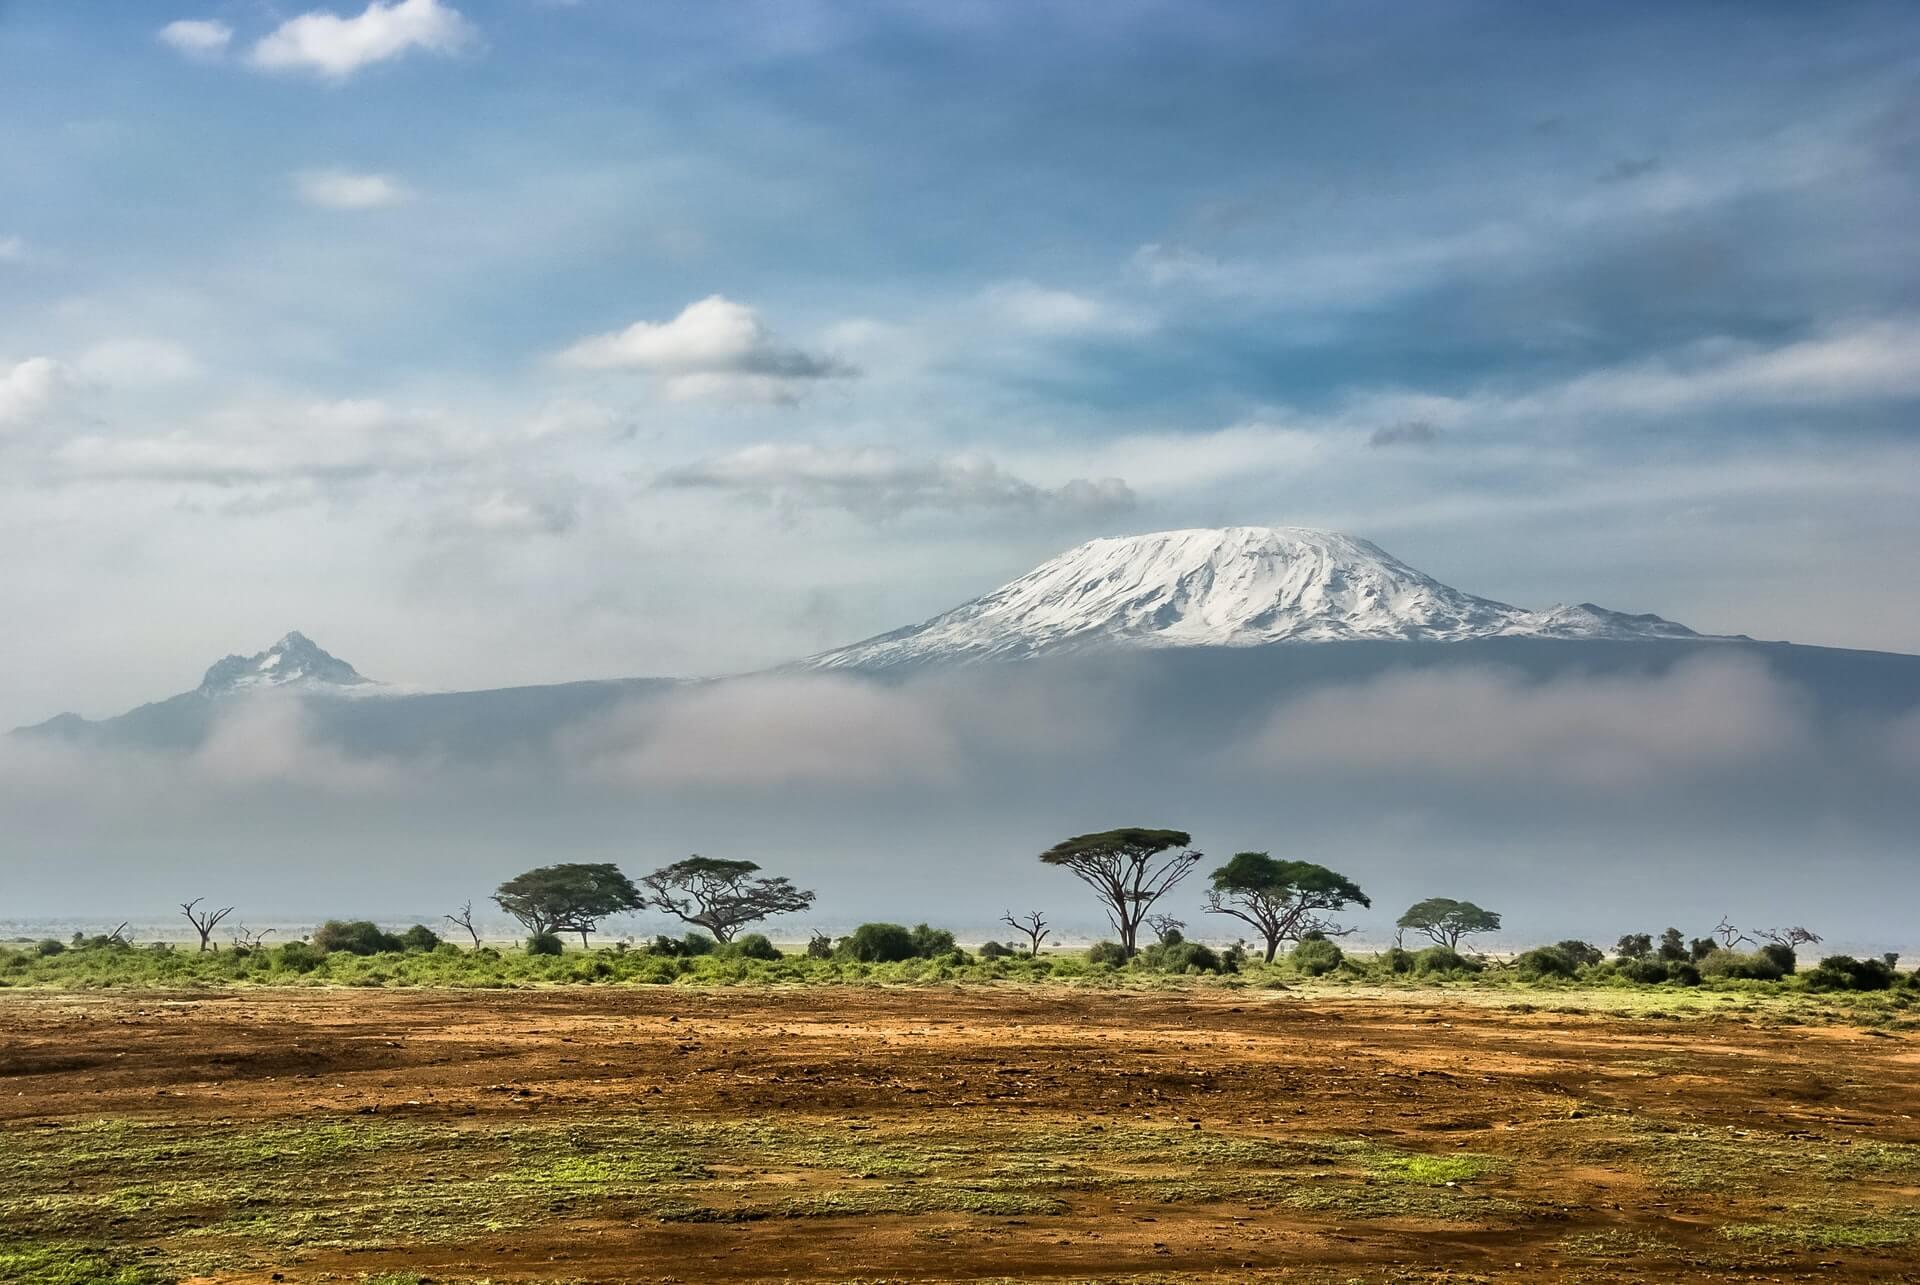 mt kilimanjaro view travel bucket list